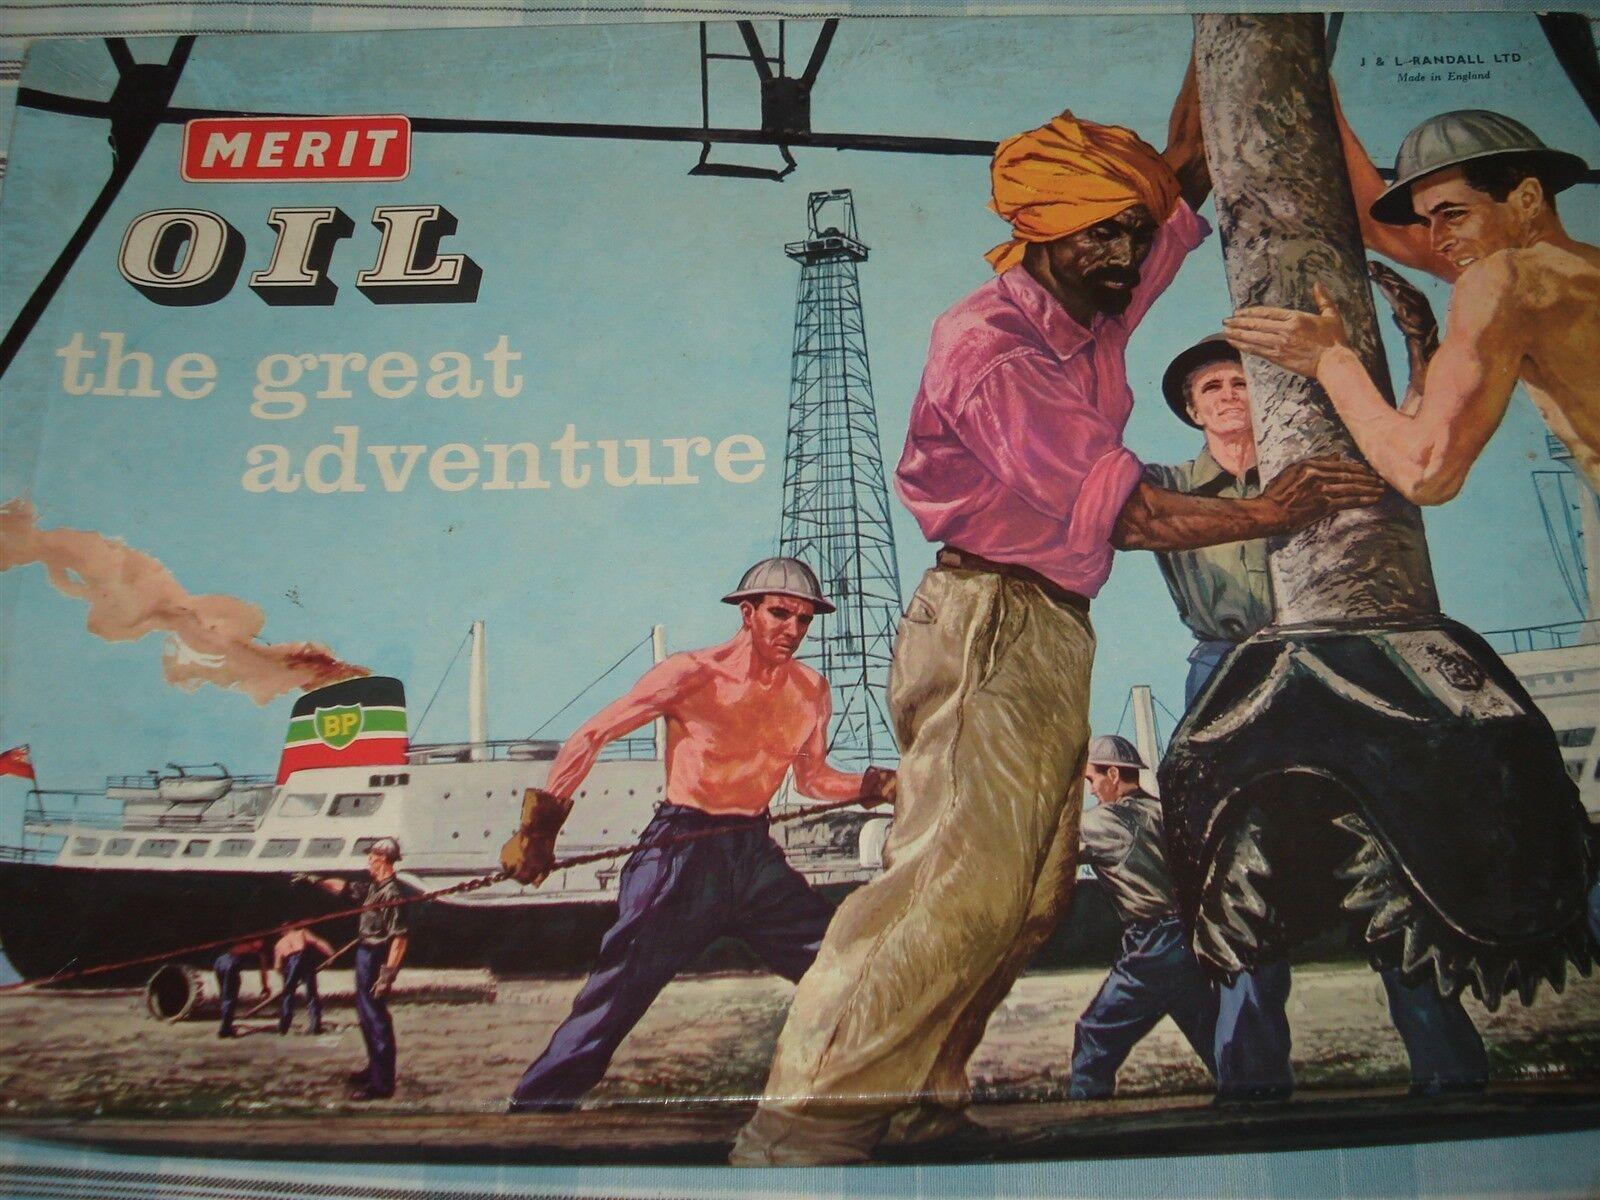 OIL GAME - THE GREAT ADVENTURE - OIL ADVENTURE GAME - MERIT - COMPLETE - 100%